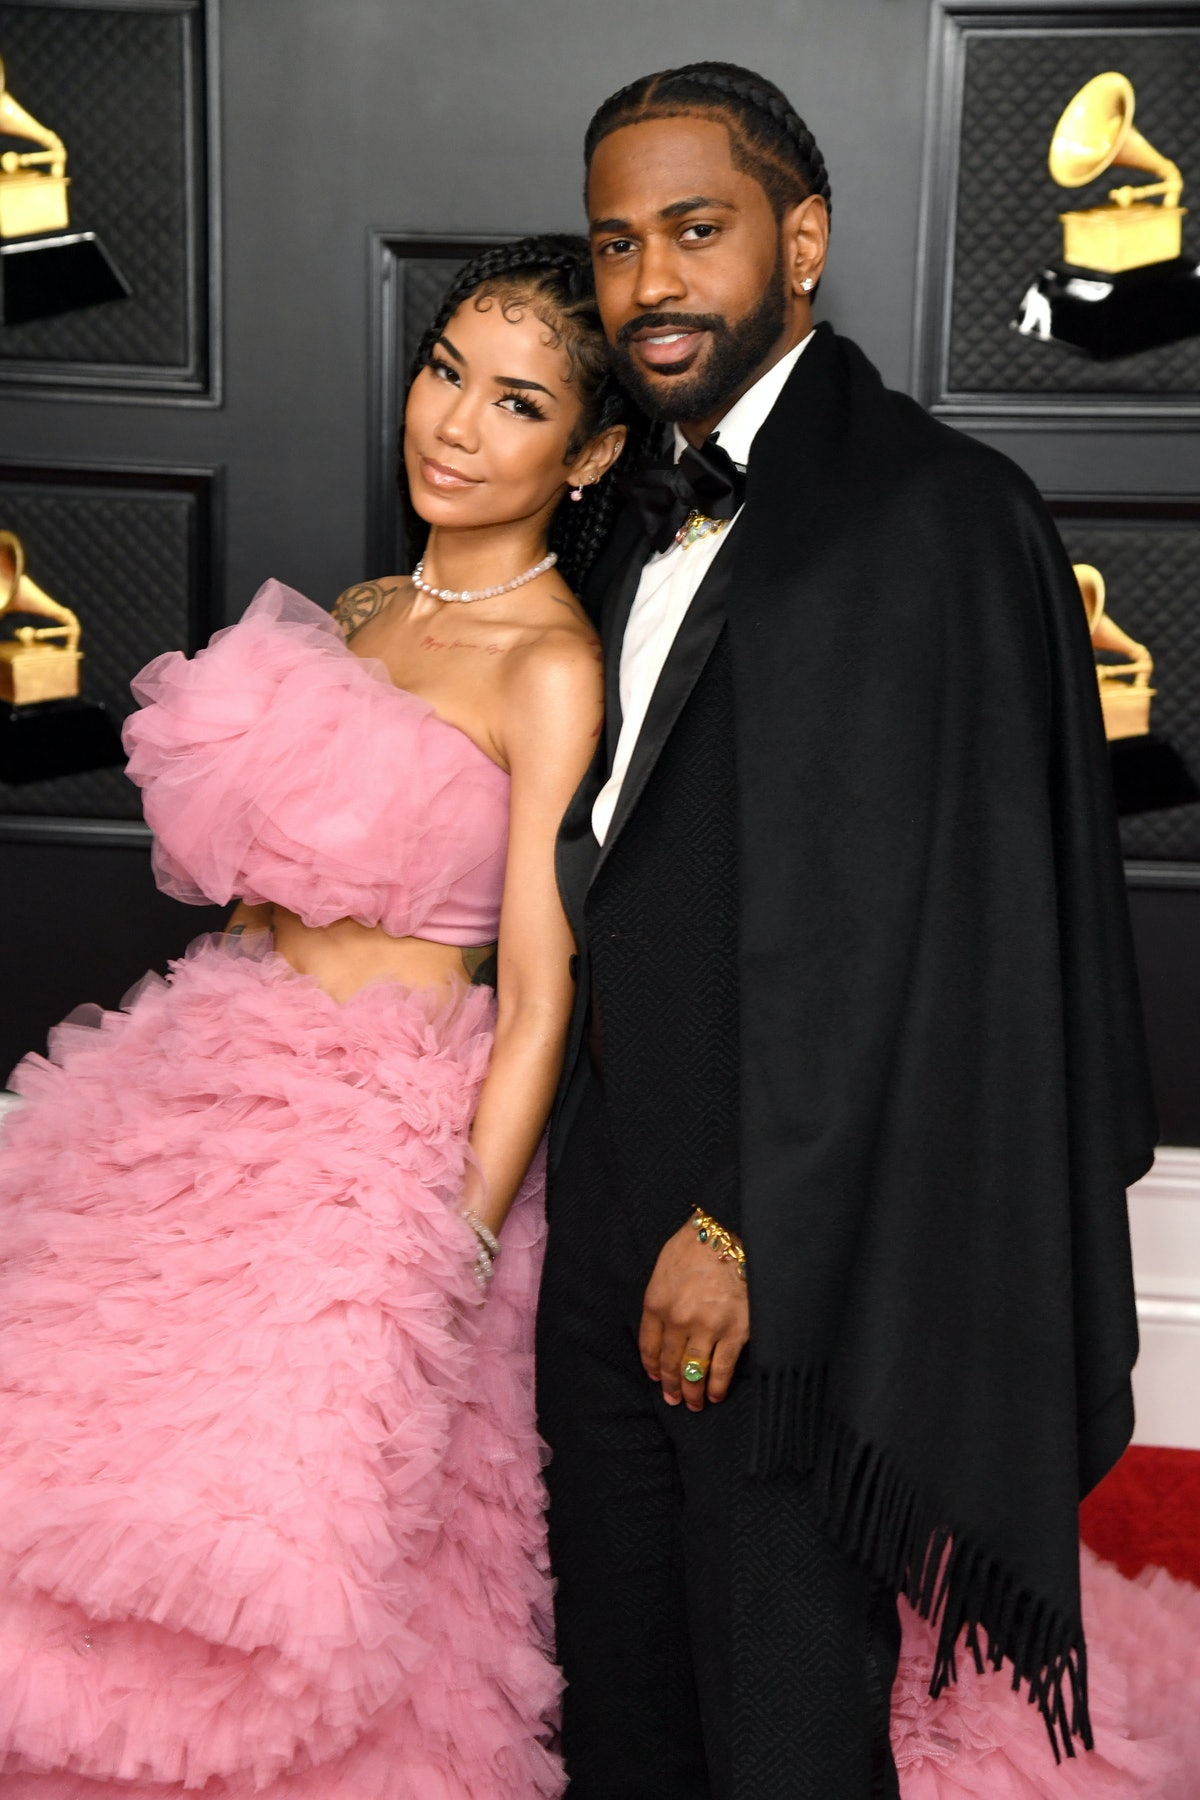 LOS ANGELES, CALIFORNIA - MARCH 14: (L-R) Jhené Aiko and Big Sean attend the 63rd Annual GRAMMY Awar...